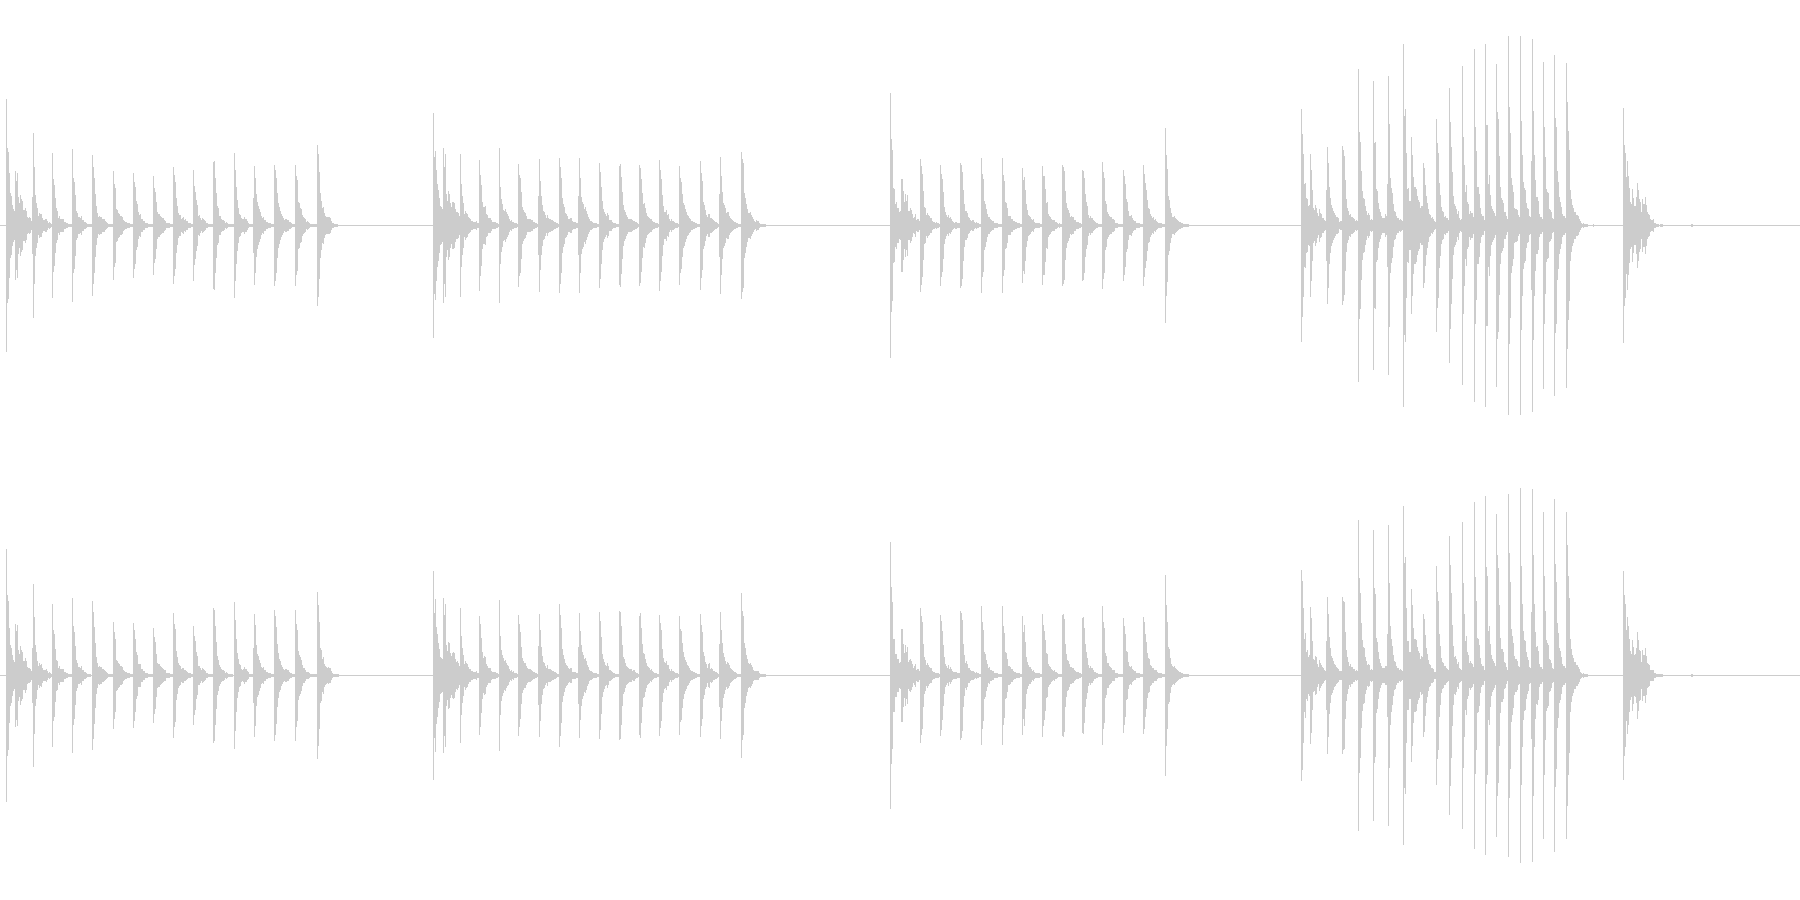 大太鼓21山ヲロシ歌舞伎情景描写和風和太の未再生の波形